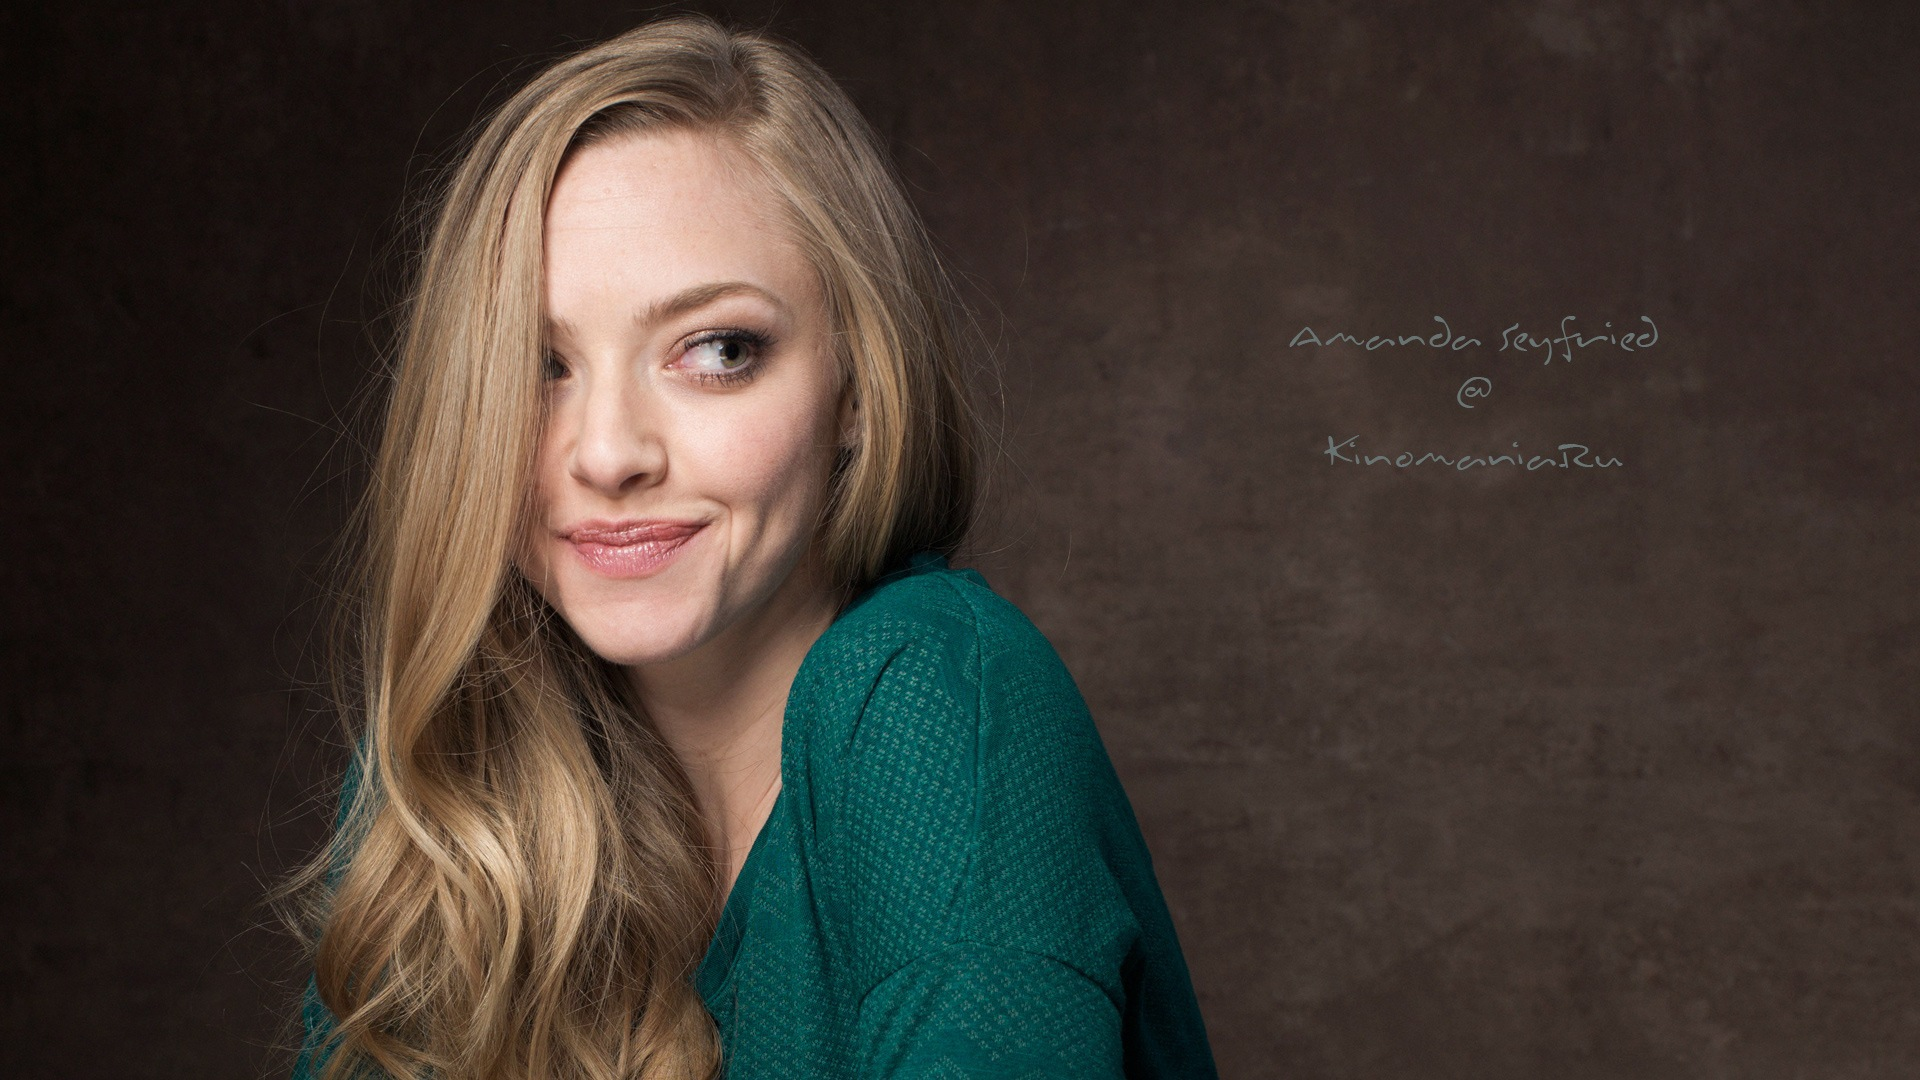 Amanda Seyfried Free HD Wallpapers